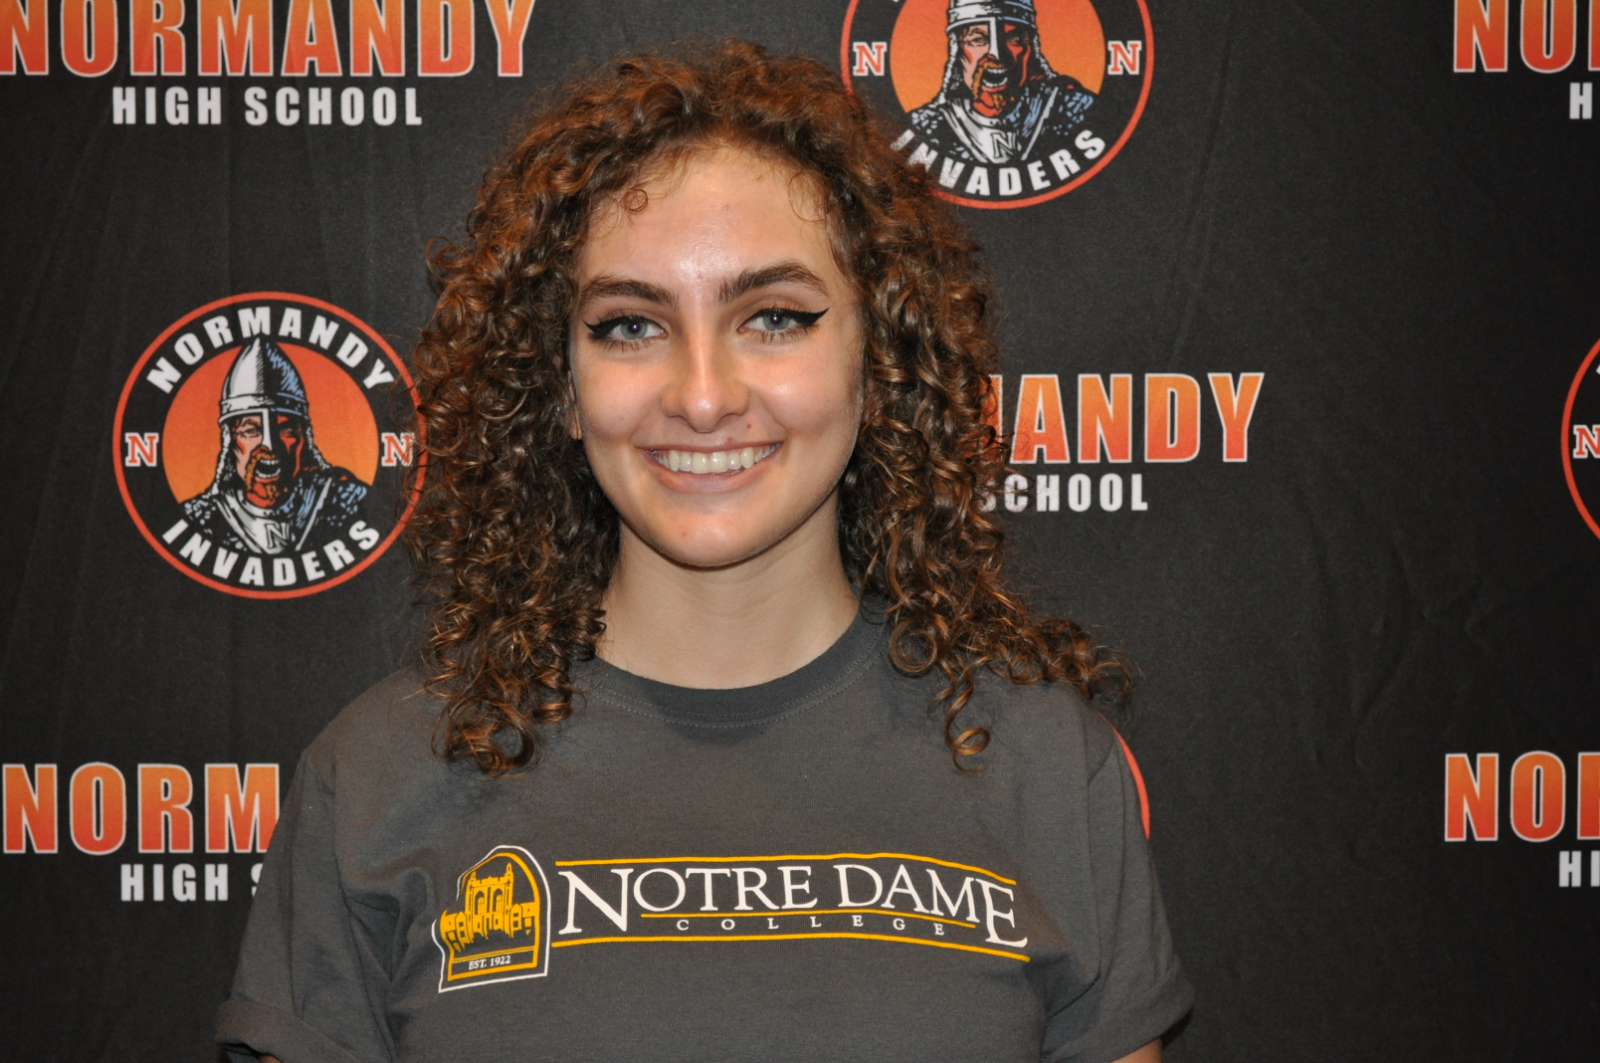 College Bound Invader Profile – Ashley Soltis